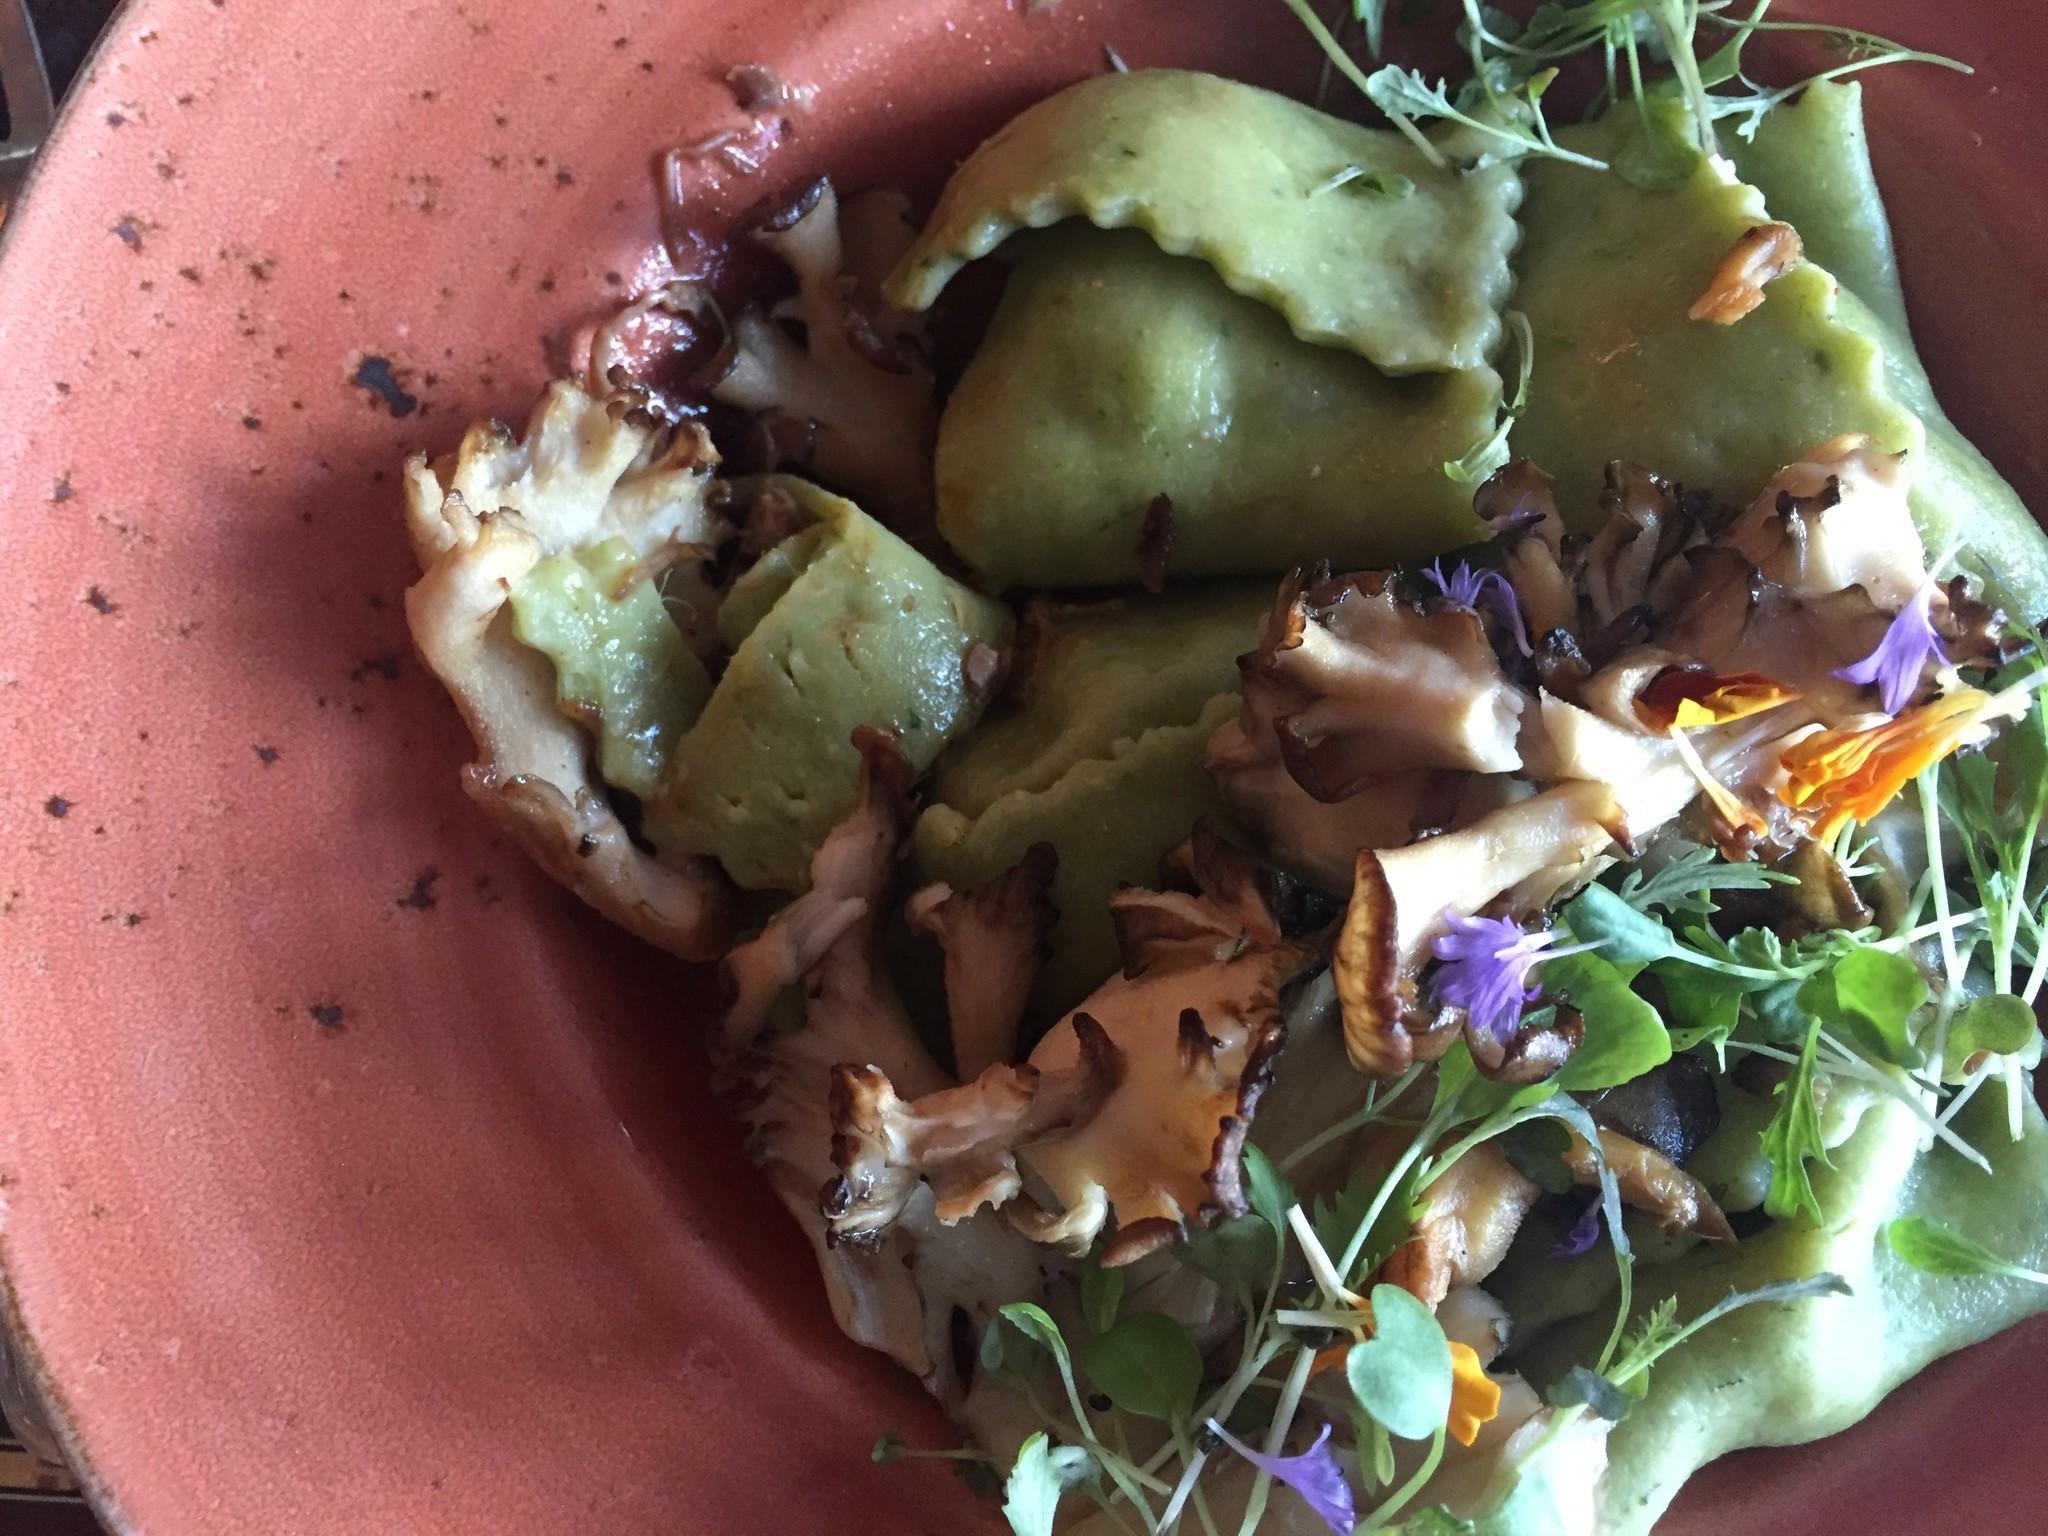 Dishes with game gator bison elk boar oh my orlando sentinel forumfinder Images